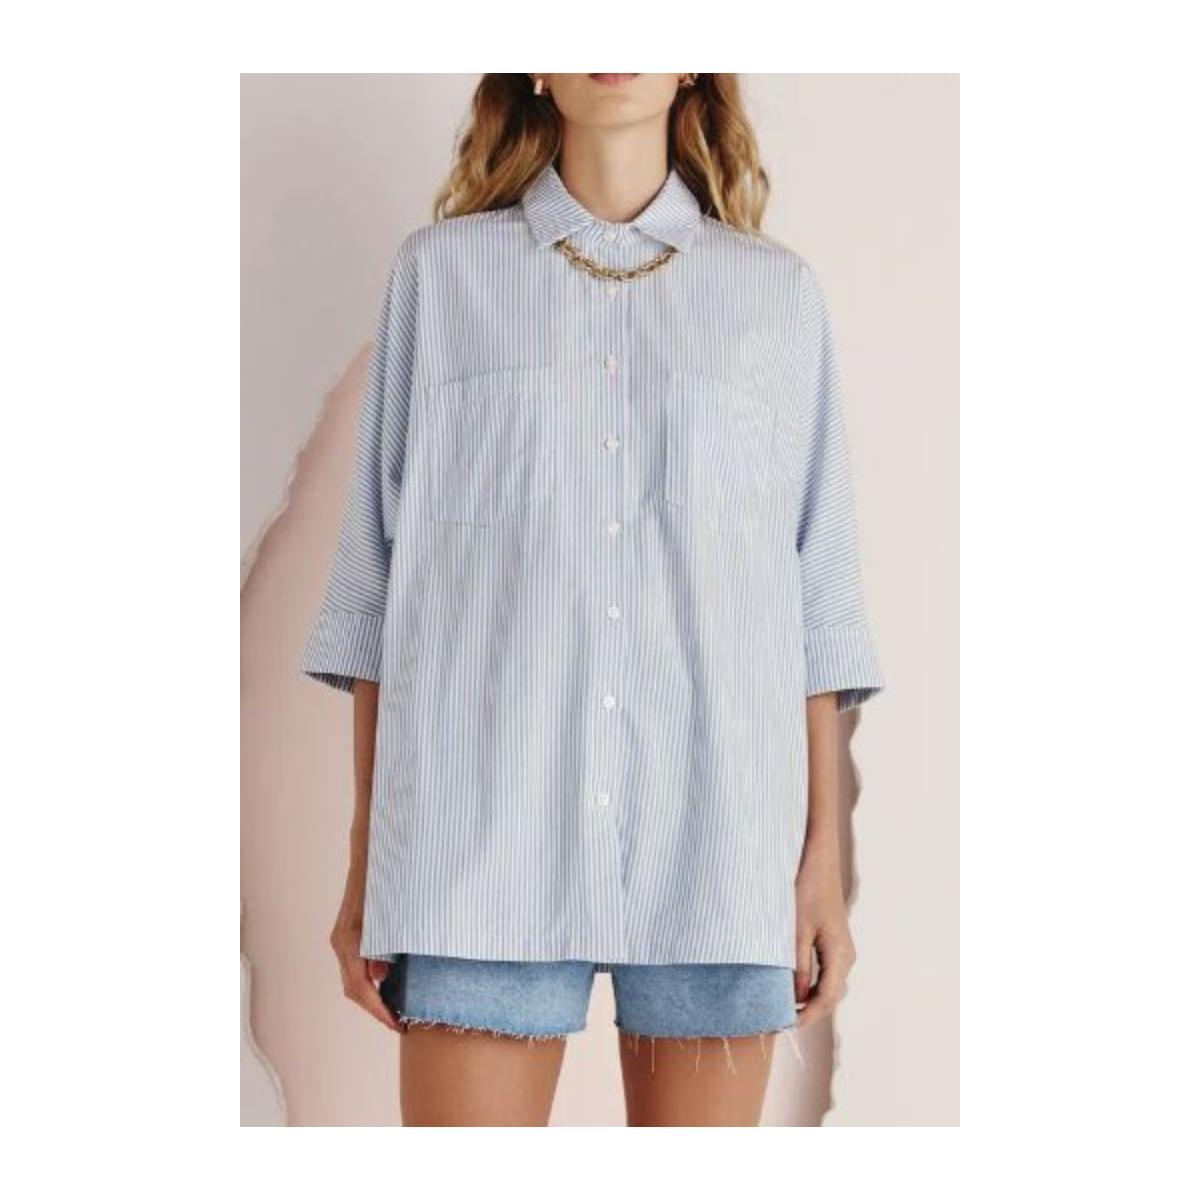 Camisa Feminina Dzarm Zinf 1cen Azul/branco